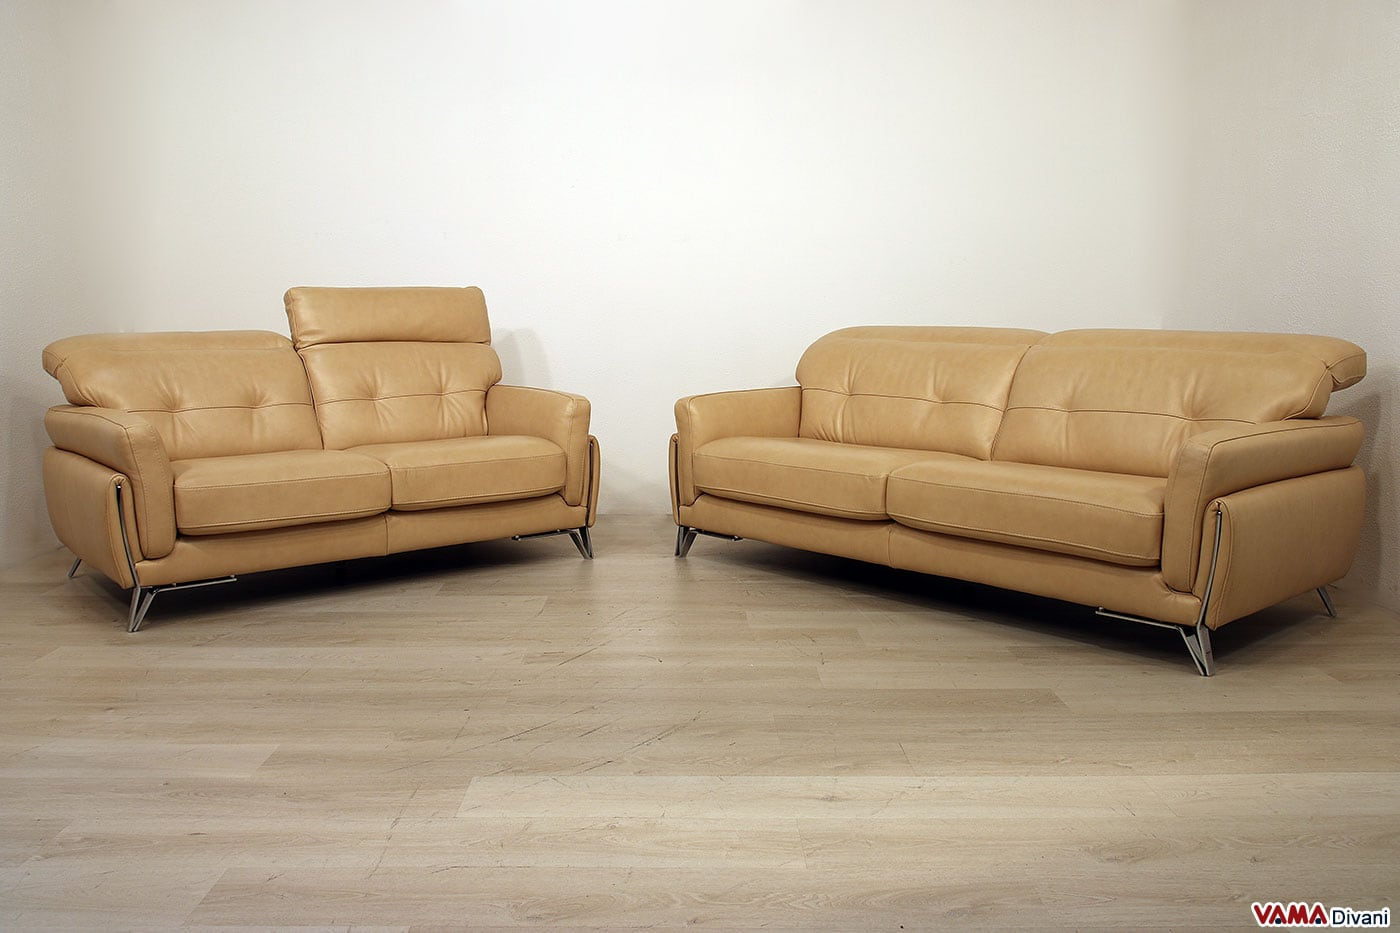 Offerta divano 3 posti ster vama divani - Divano 3 posti misure ...